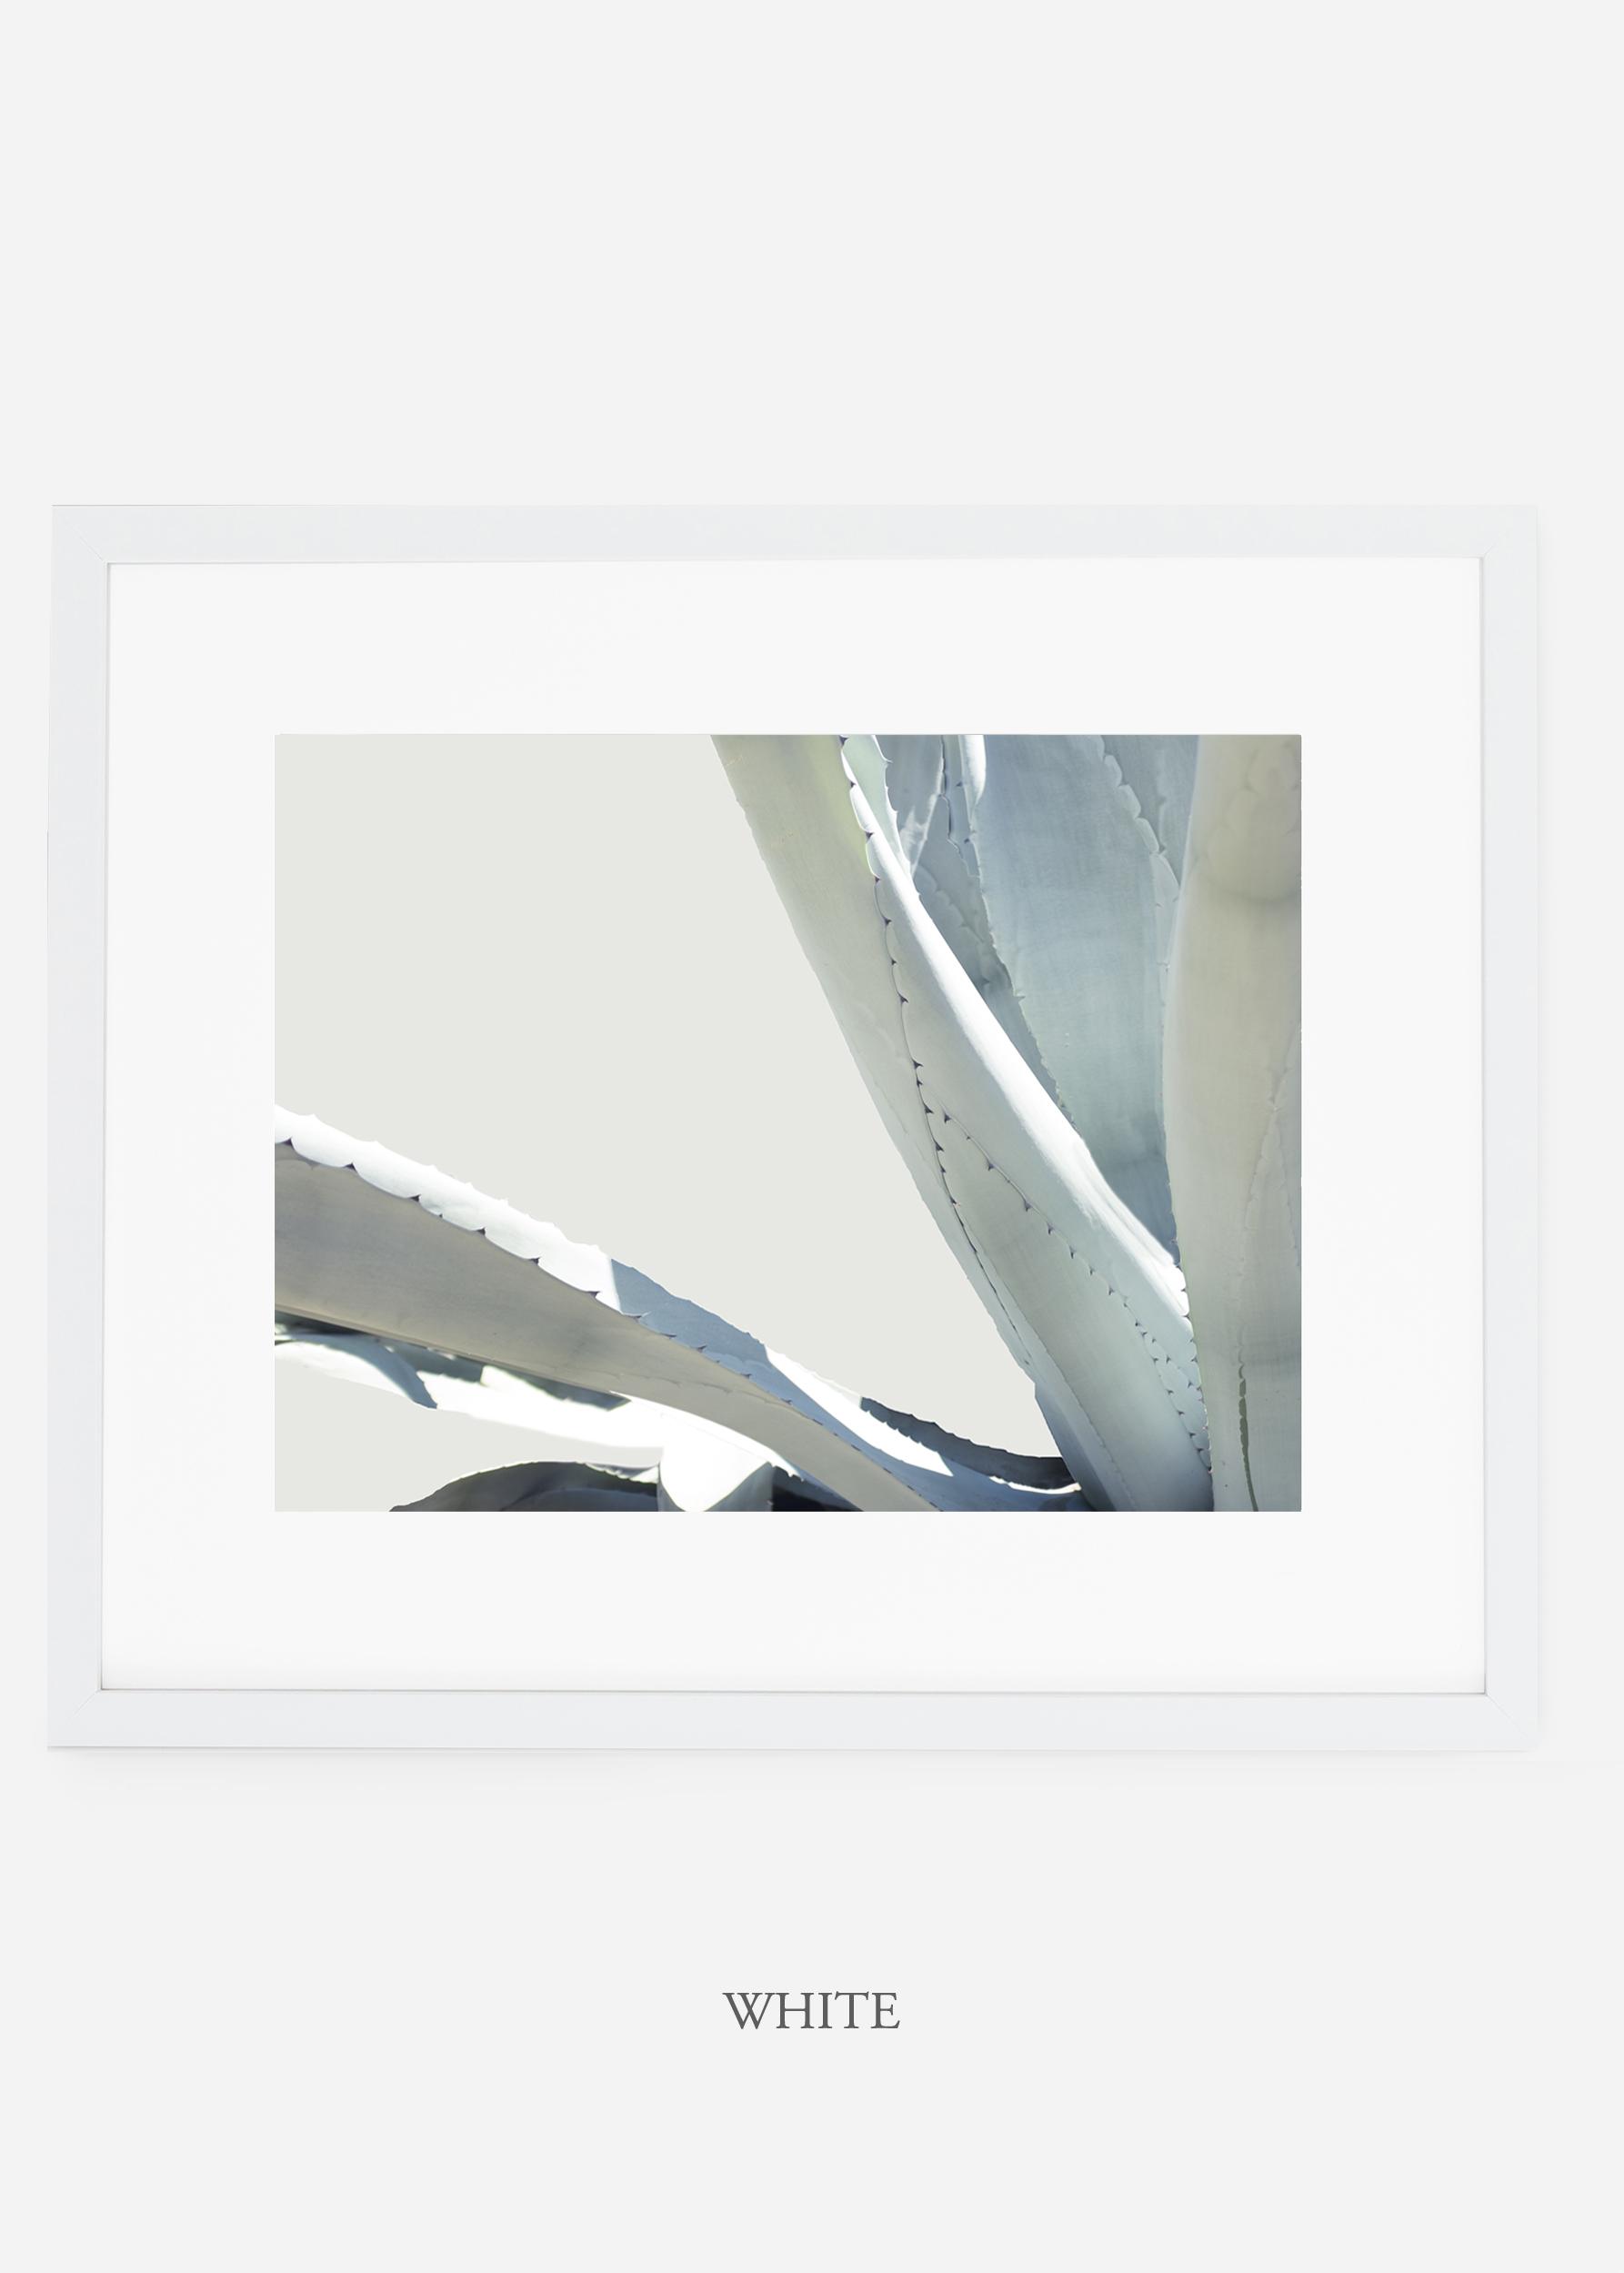 WilderCalifornia_whiteframe_WinterWhite_No6_Art_Photography_interiordesign_agave.jpg